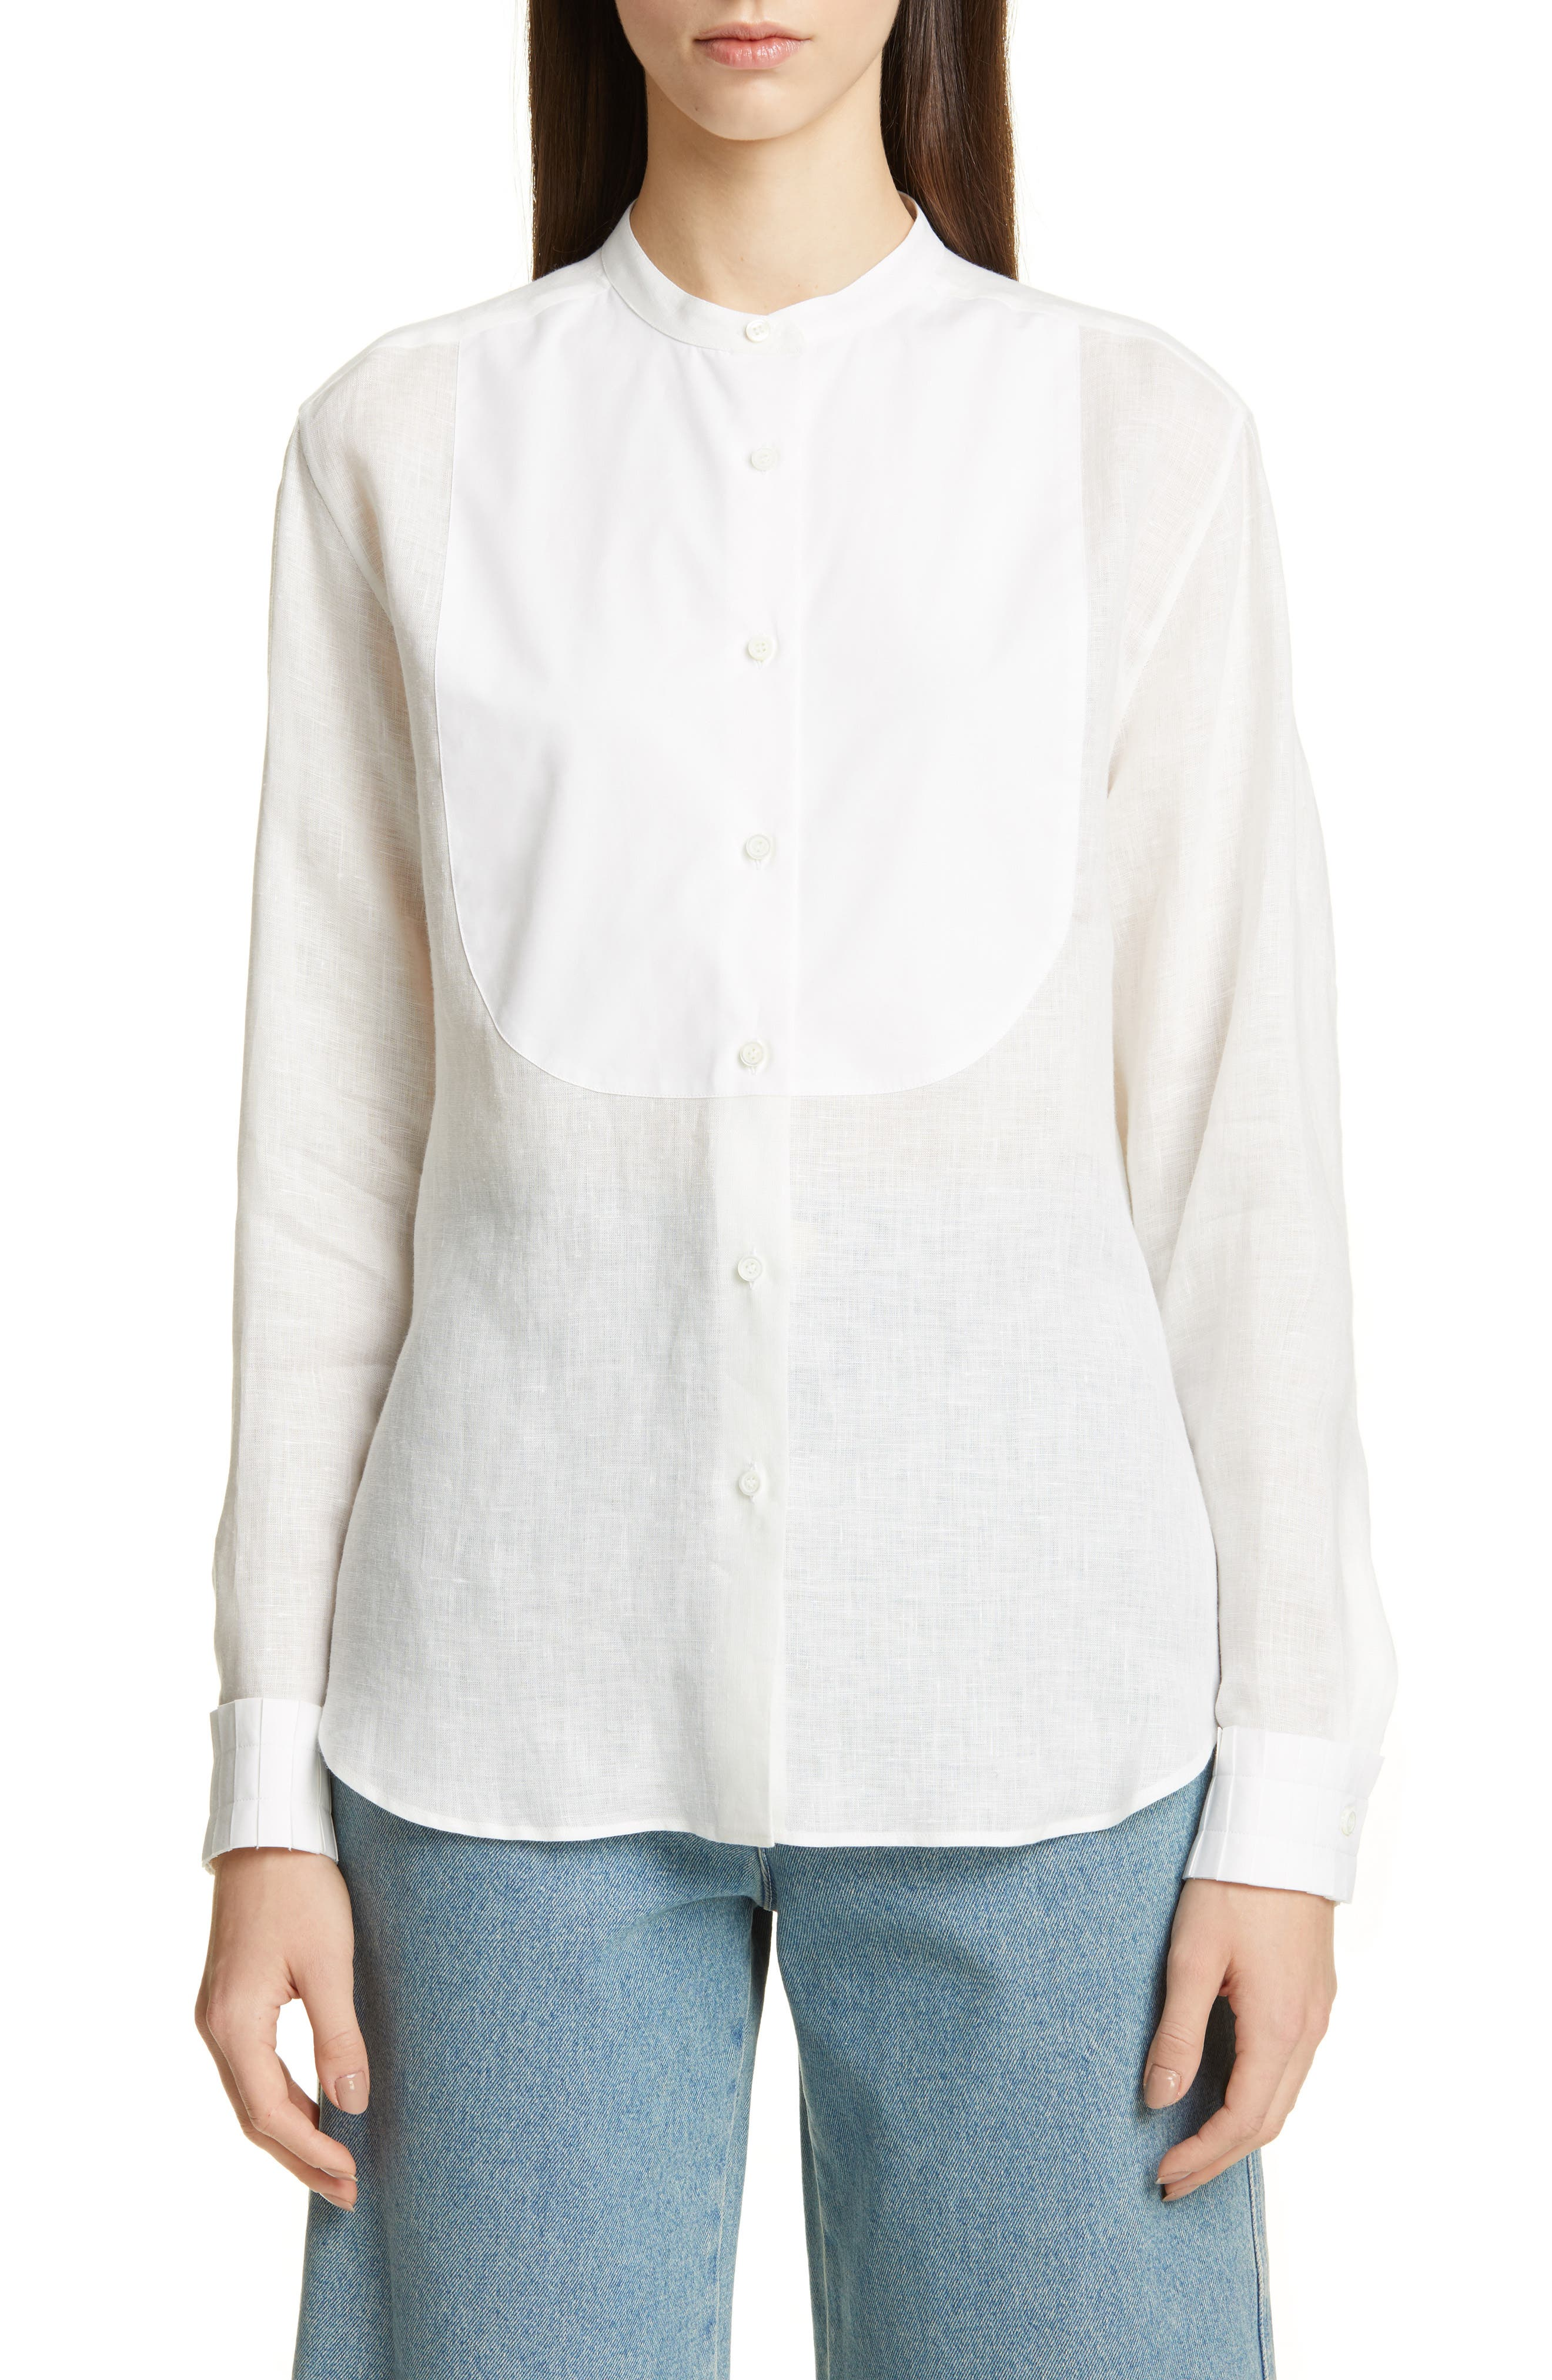 Loewe T-shirts Contrast Bib Linen Shirt